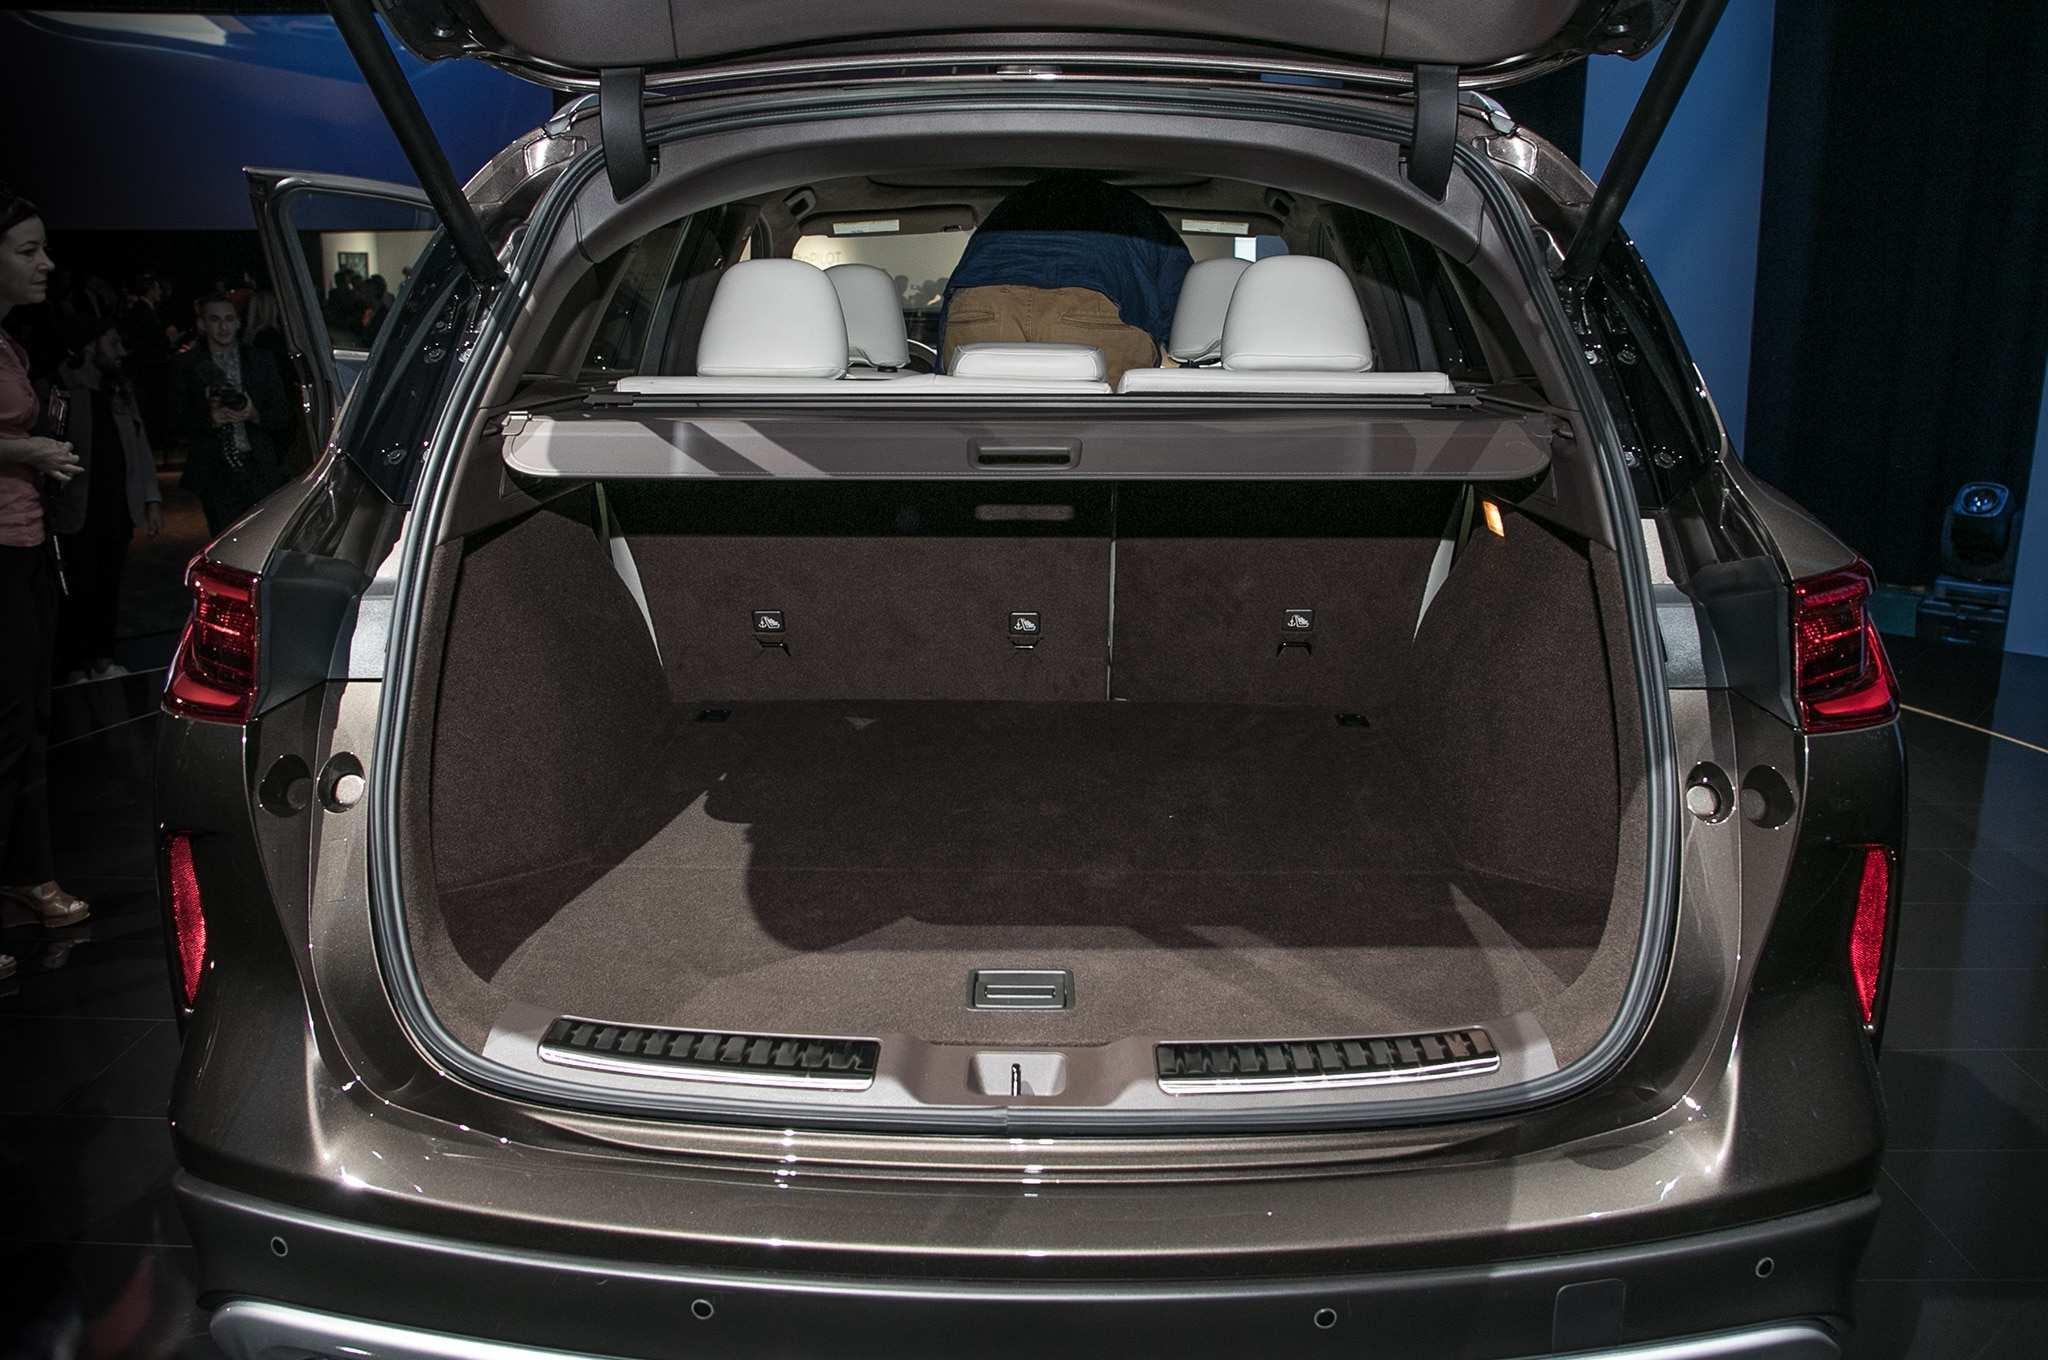 62 Concept of Best Infiniti Qx50 2019 Trunk Space Price Interior with Best Infiniti Qx50 2019 Trunk Space Price